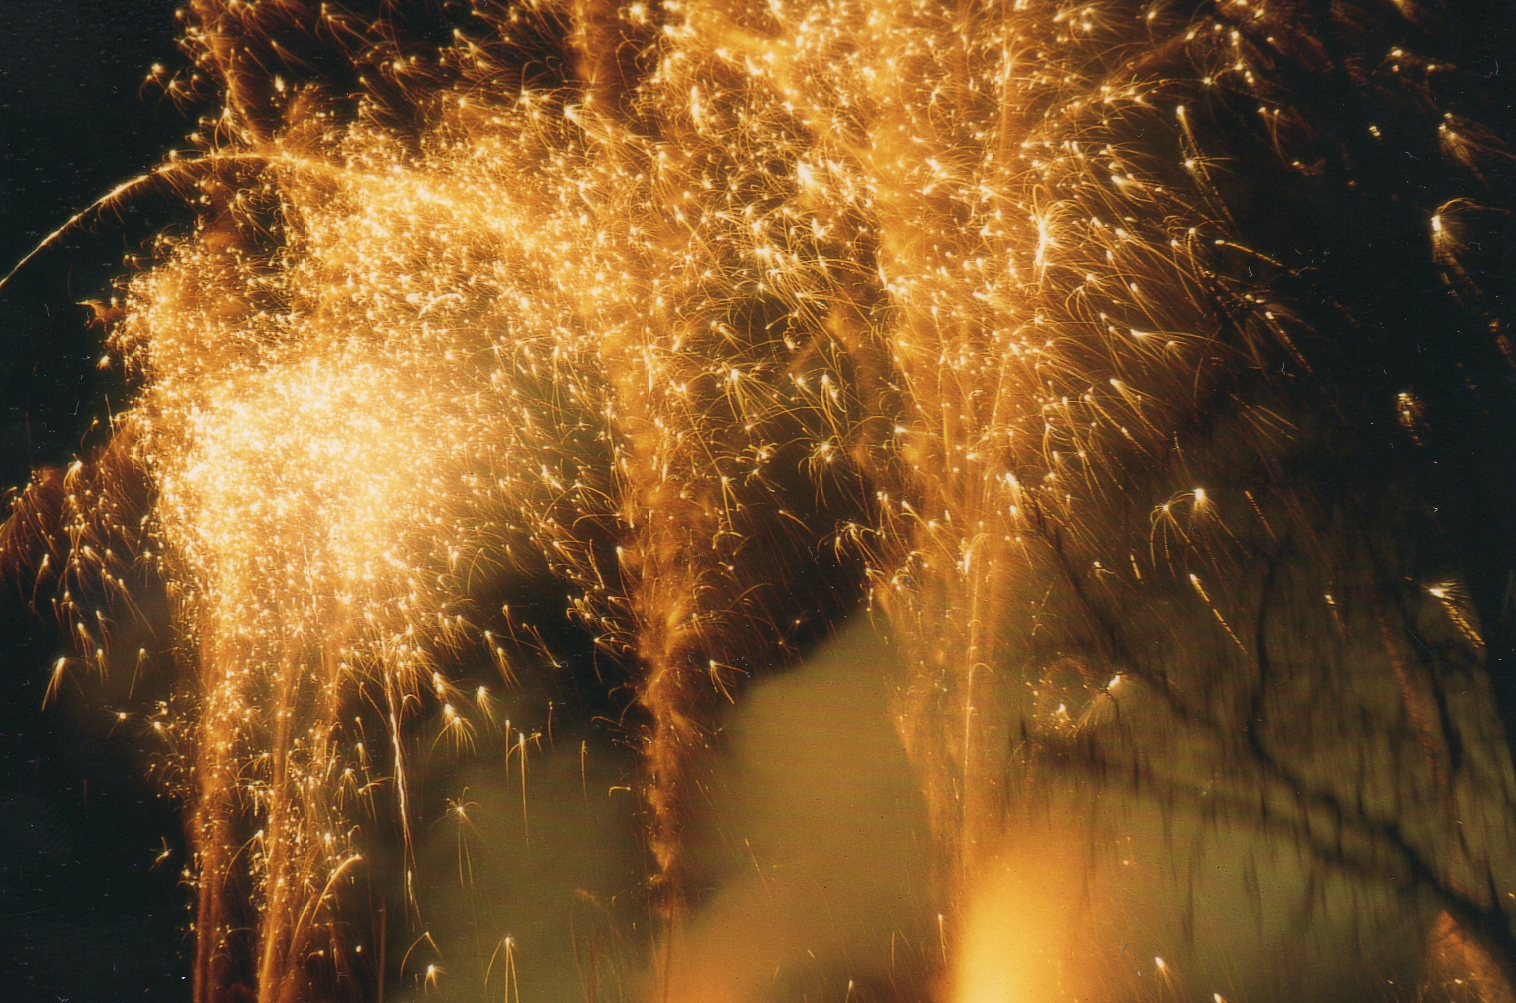 Party Feuerwerk